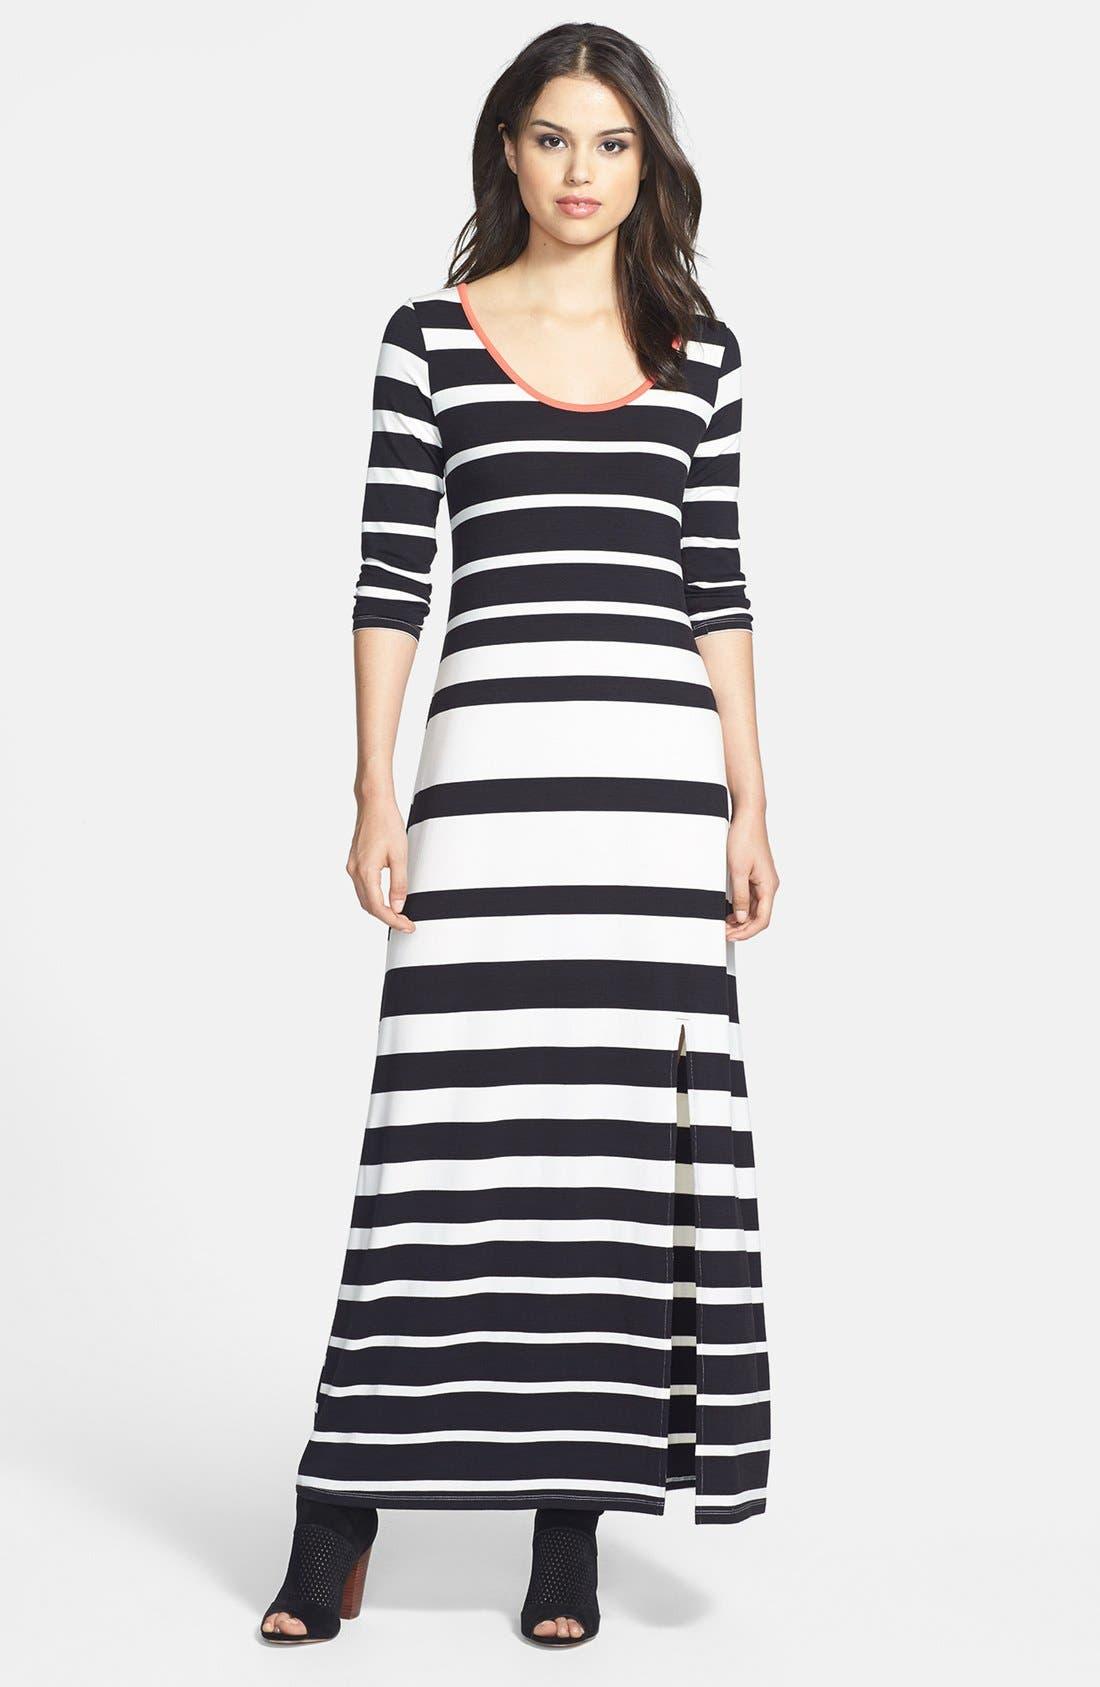 JESSICA SIMPSON 'Reah' Stripe Maxi Dress, Main, color, 001